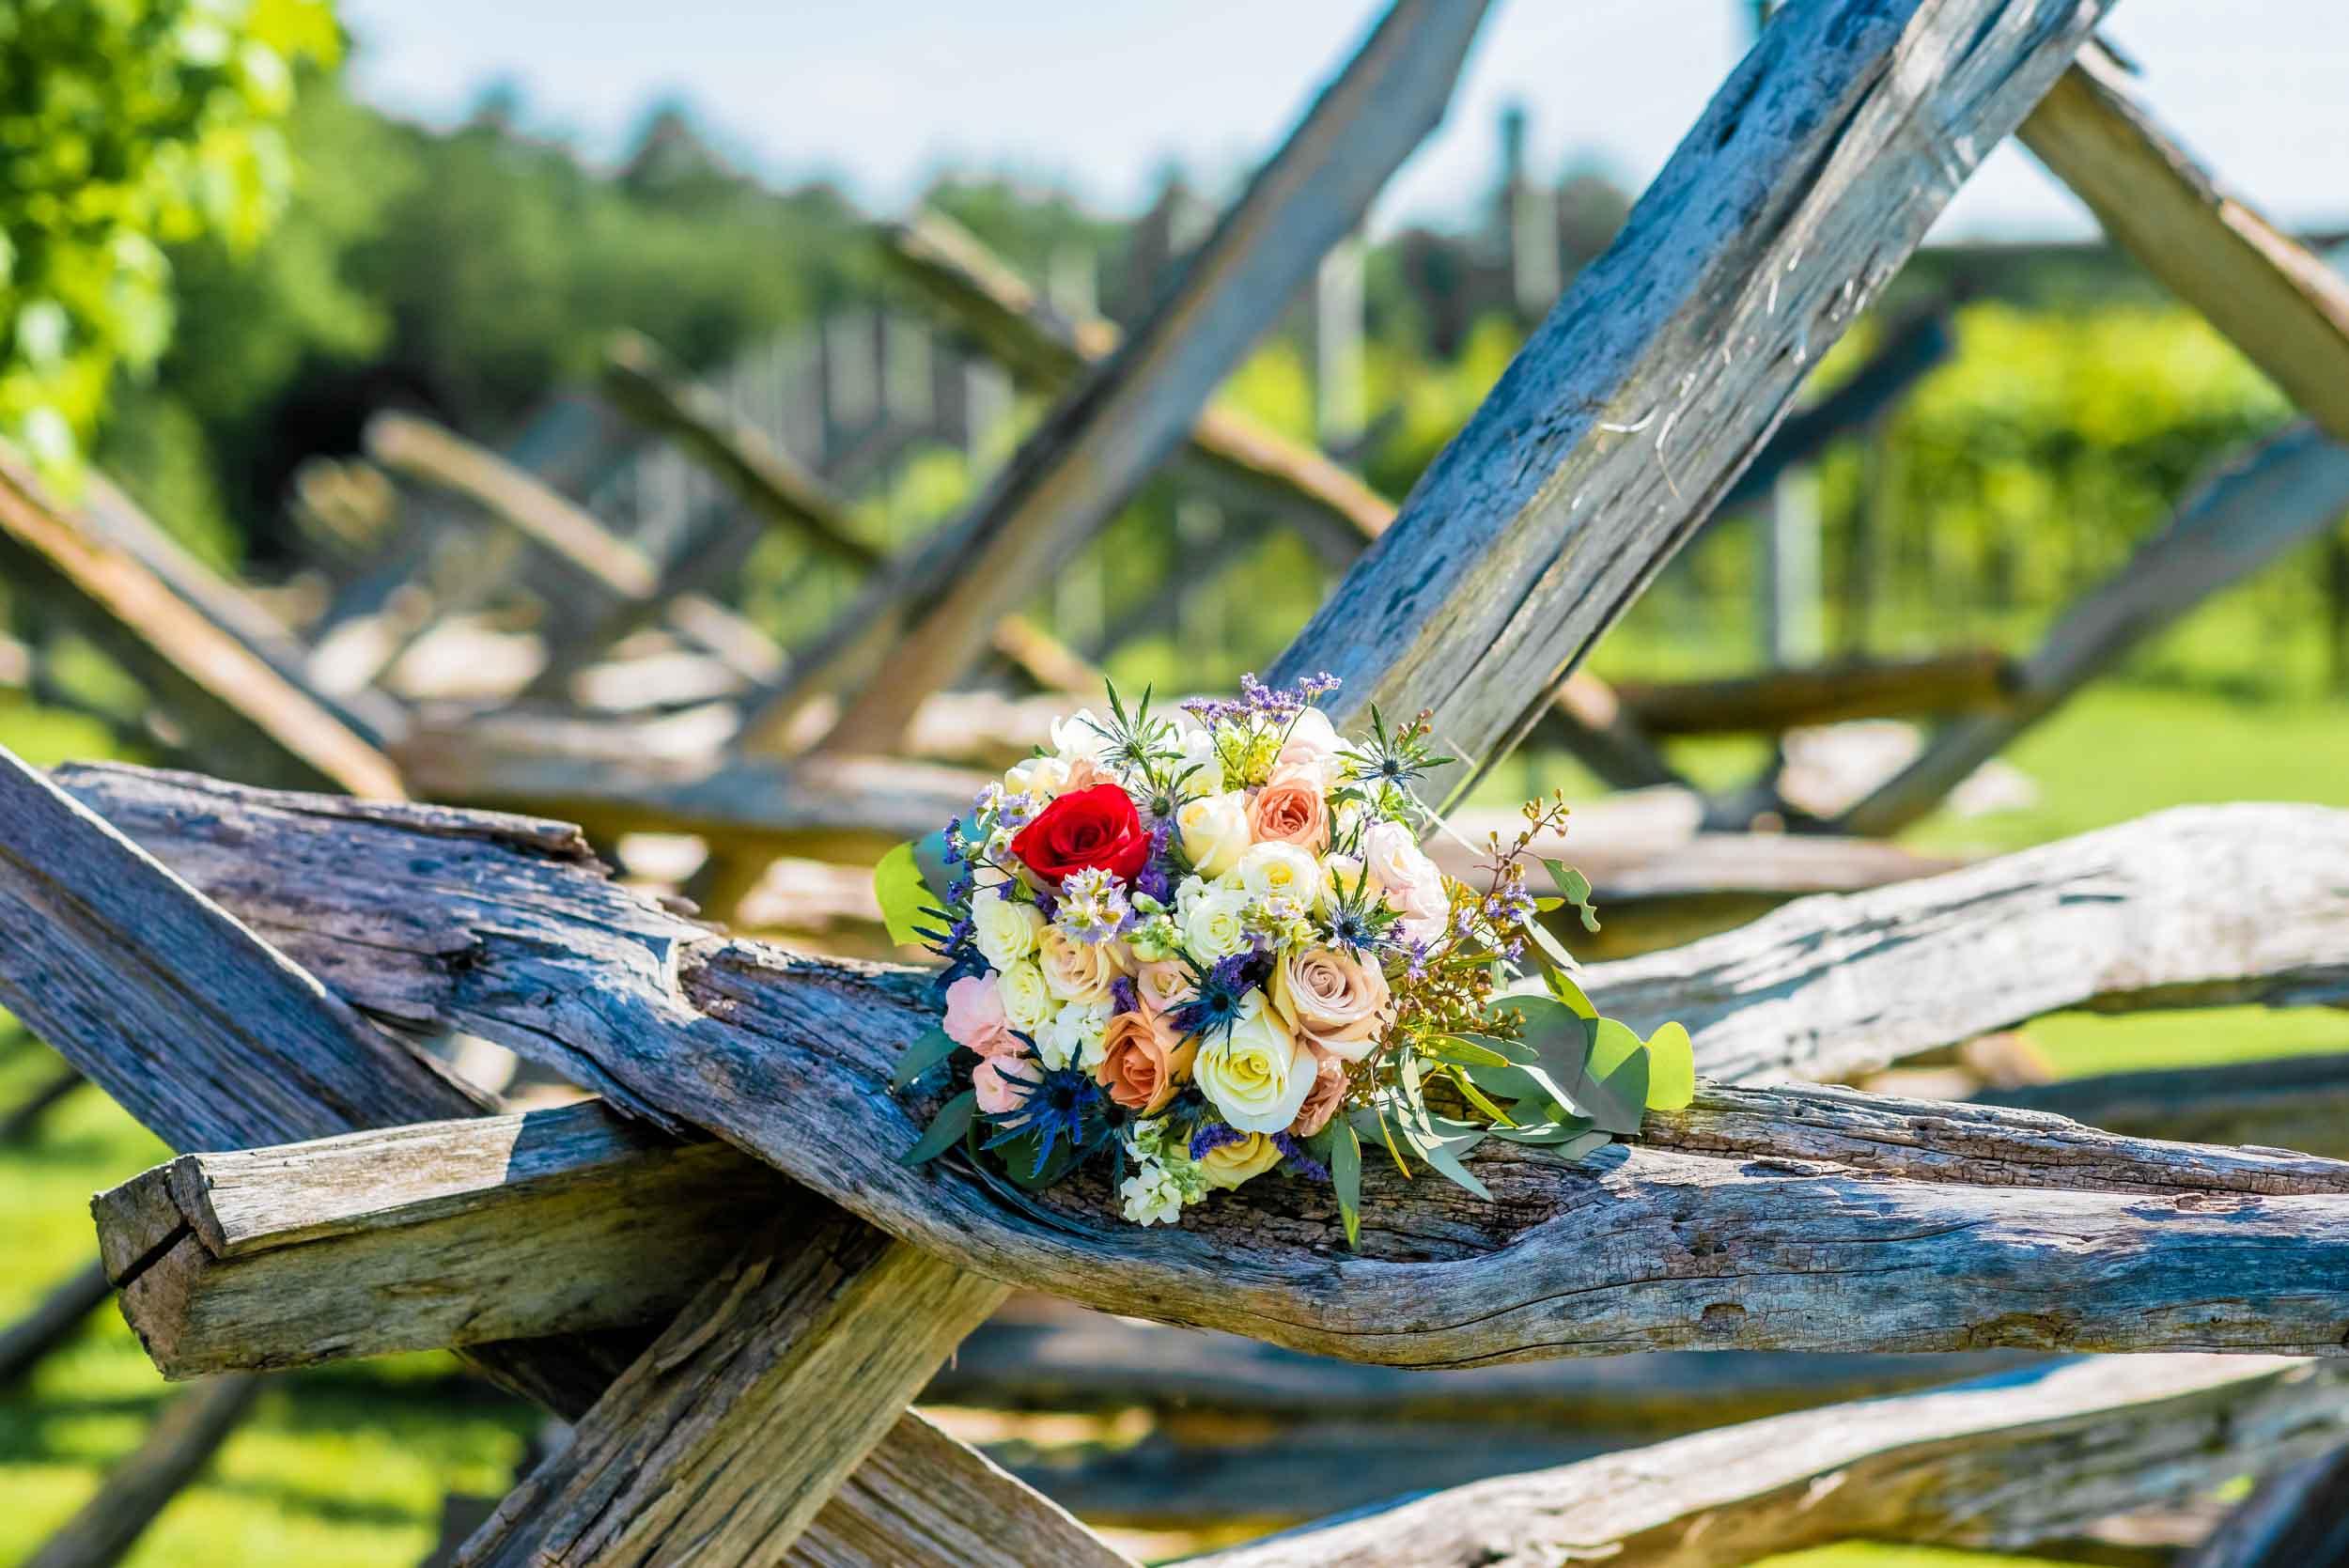 dc+metro+wedding+photographer+vadym+guliuk+photography+wedding+flowers-2021.jpg